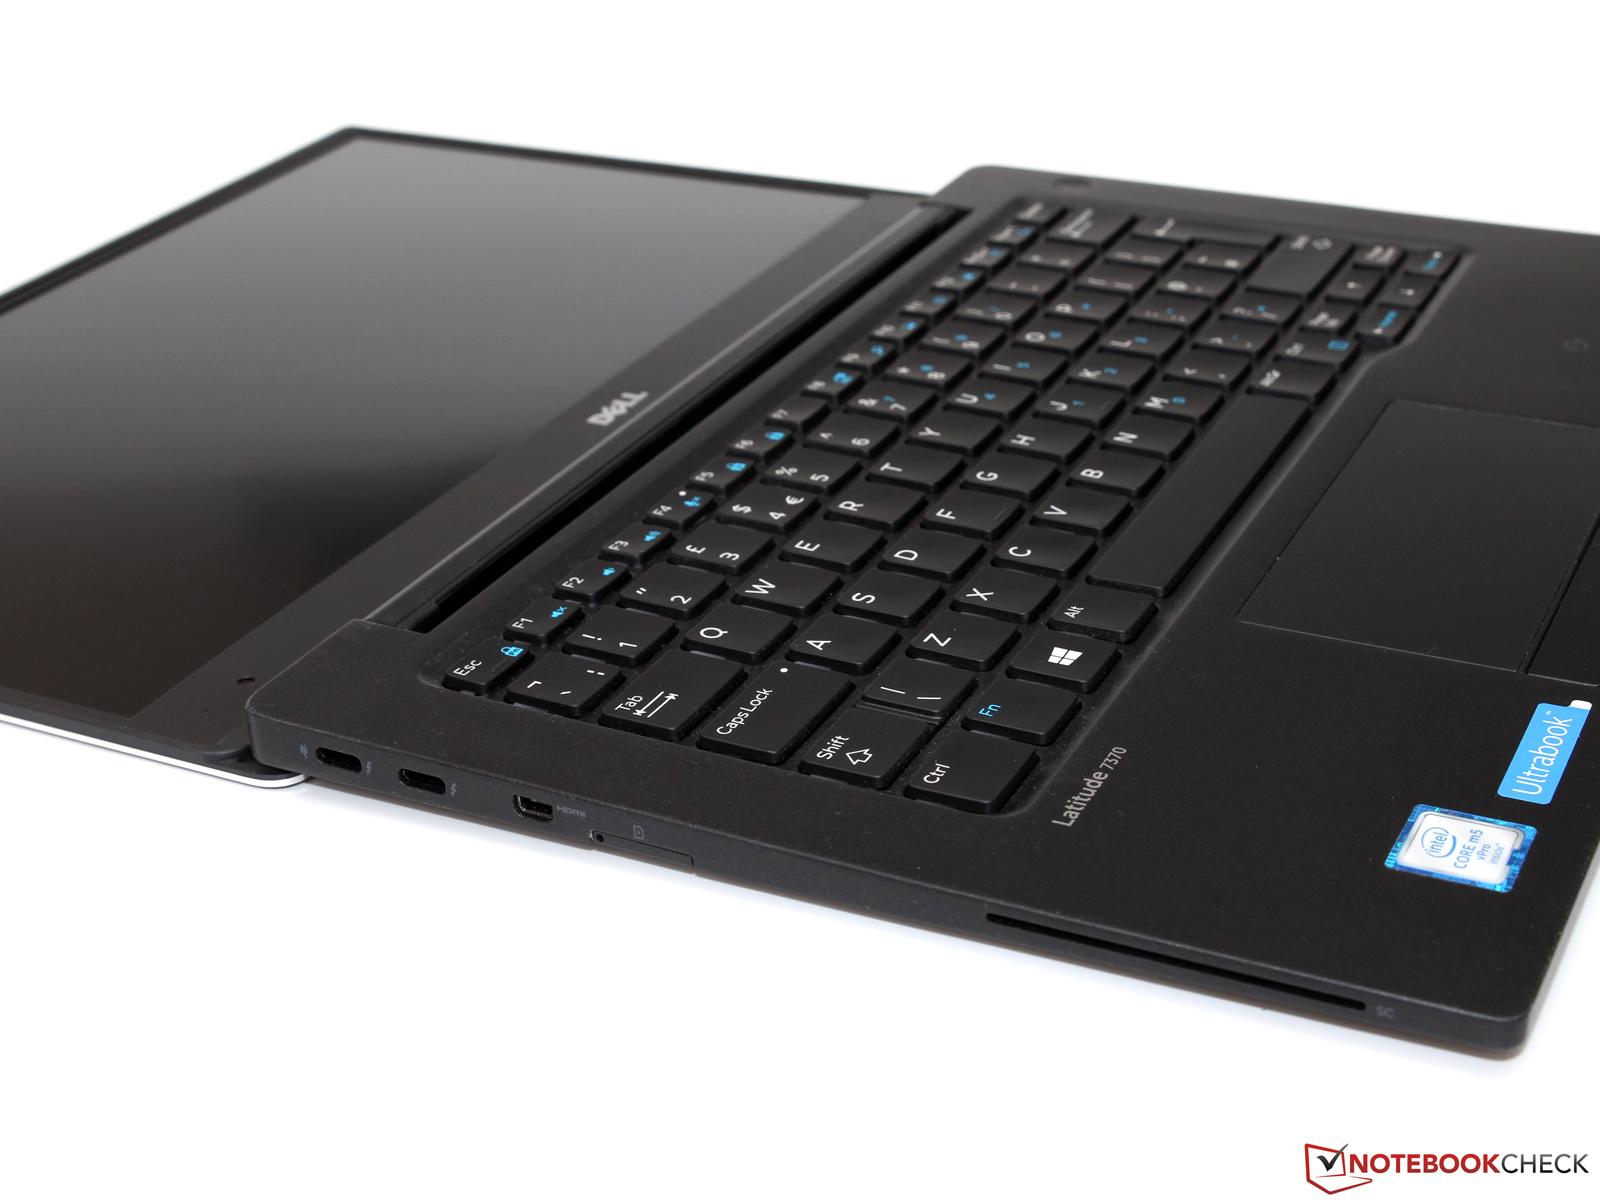 Courte Critique De L Ultrabook Dell Latitude 13 7370